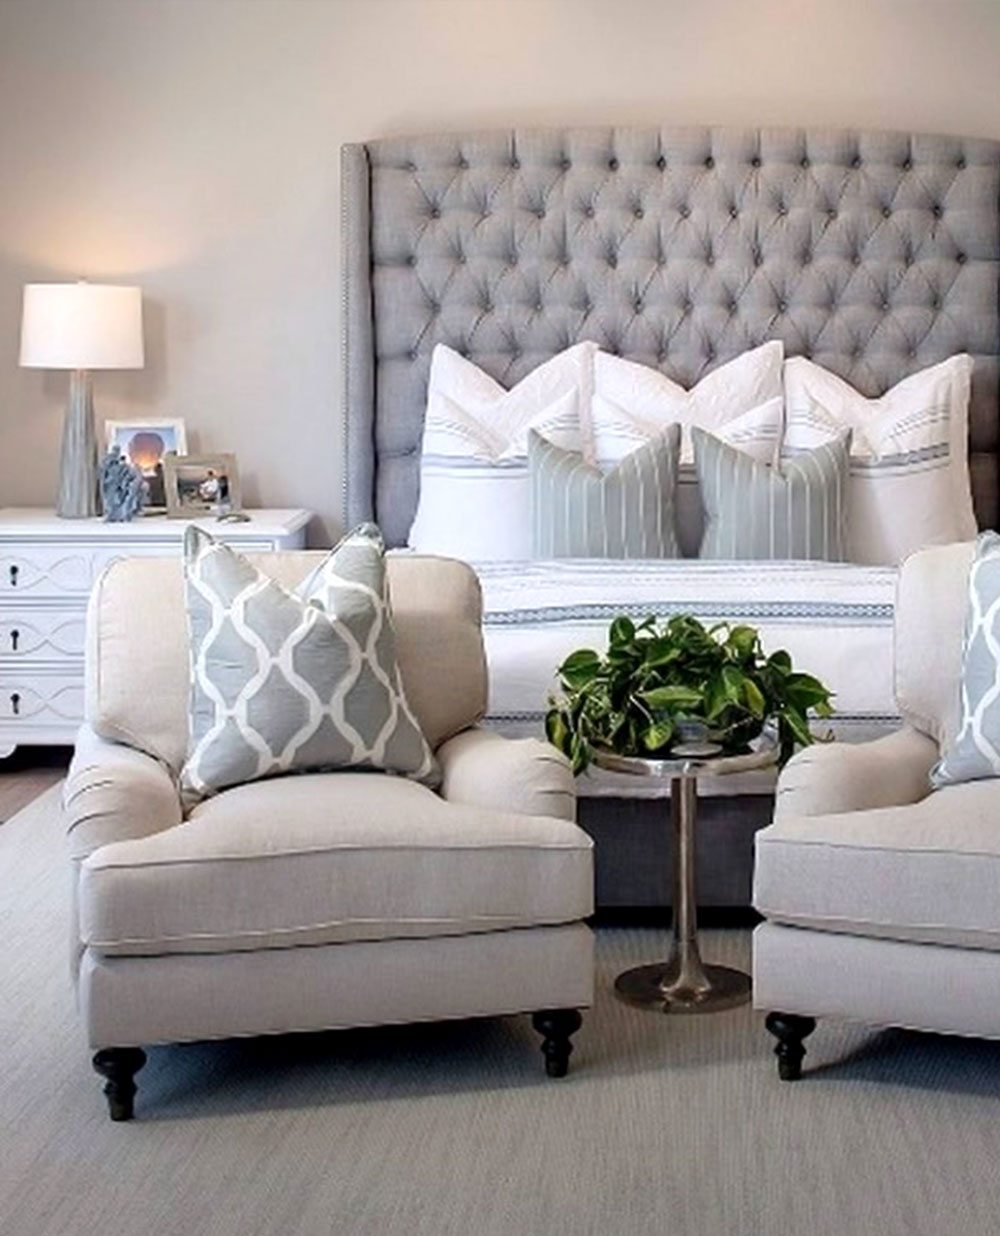 decorasion bedroom design3 - نکاتی در مورد تزیین اتاق خواب